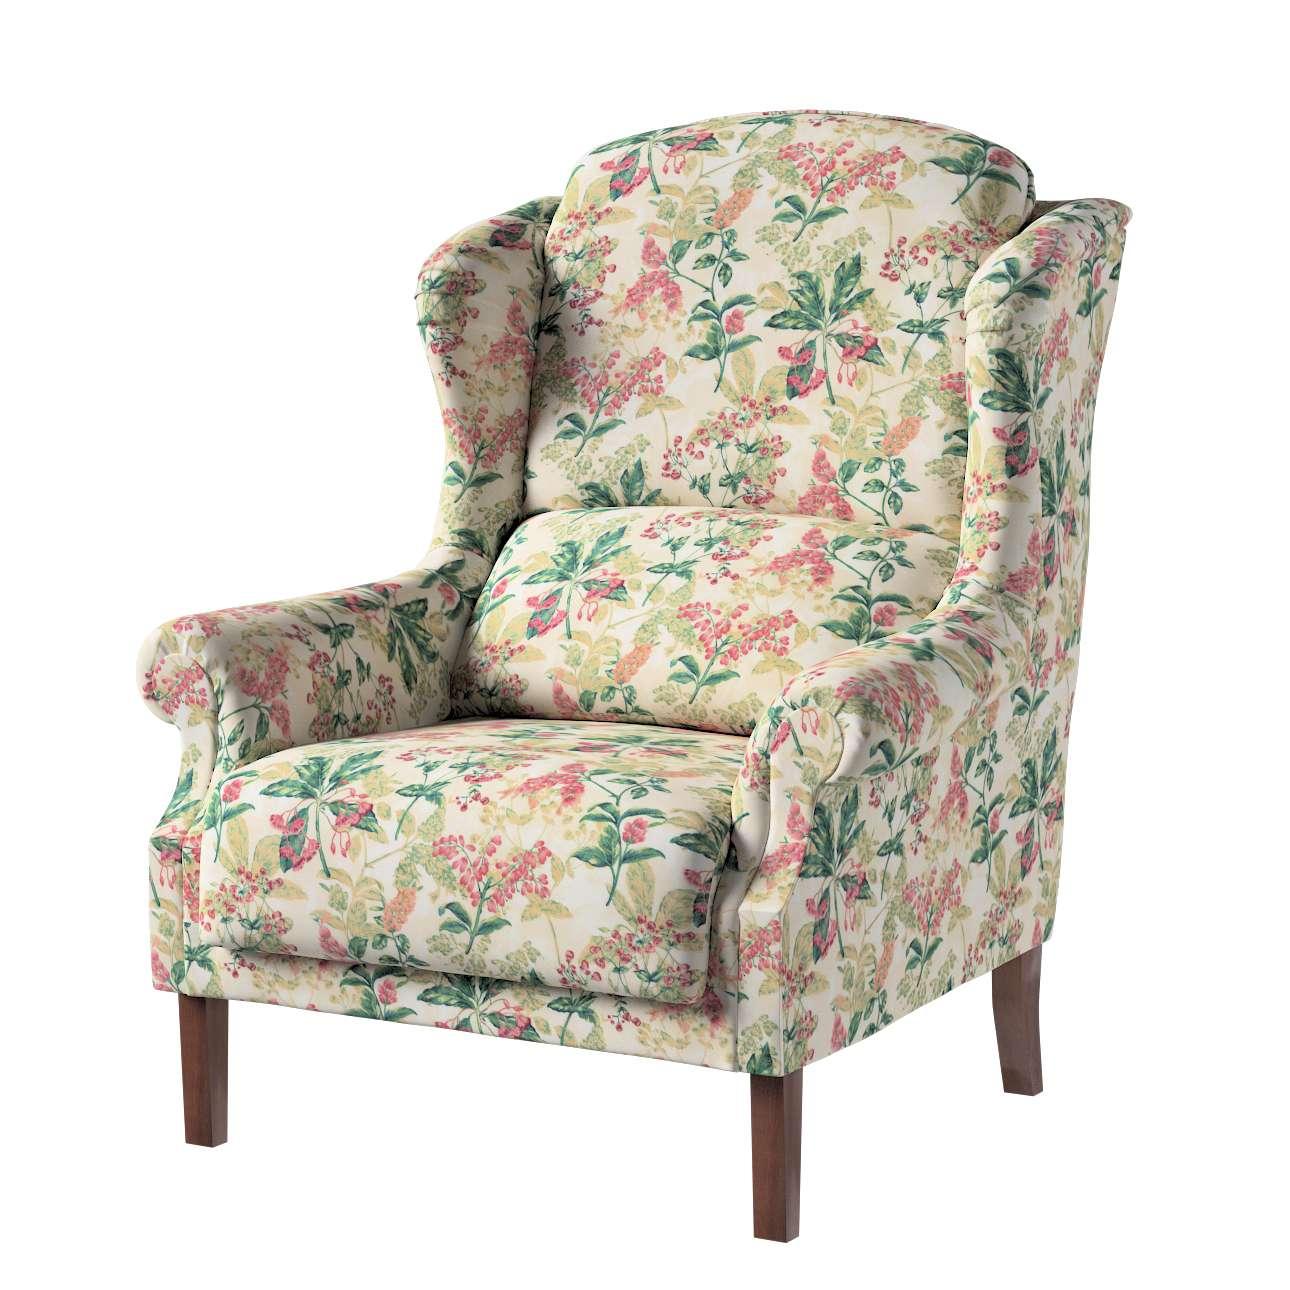 Fotel Unique w kolekcji Londres, tkanina: 143-41